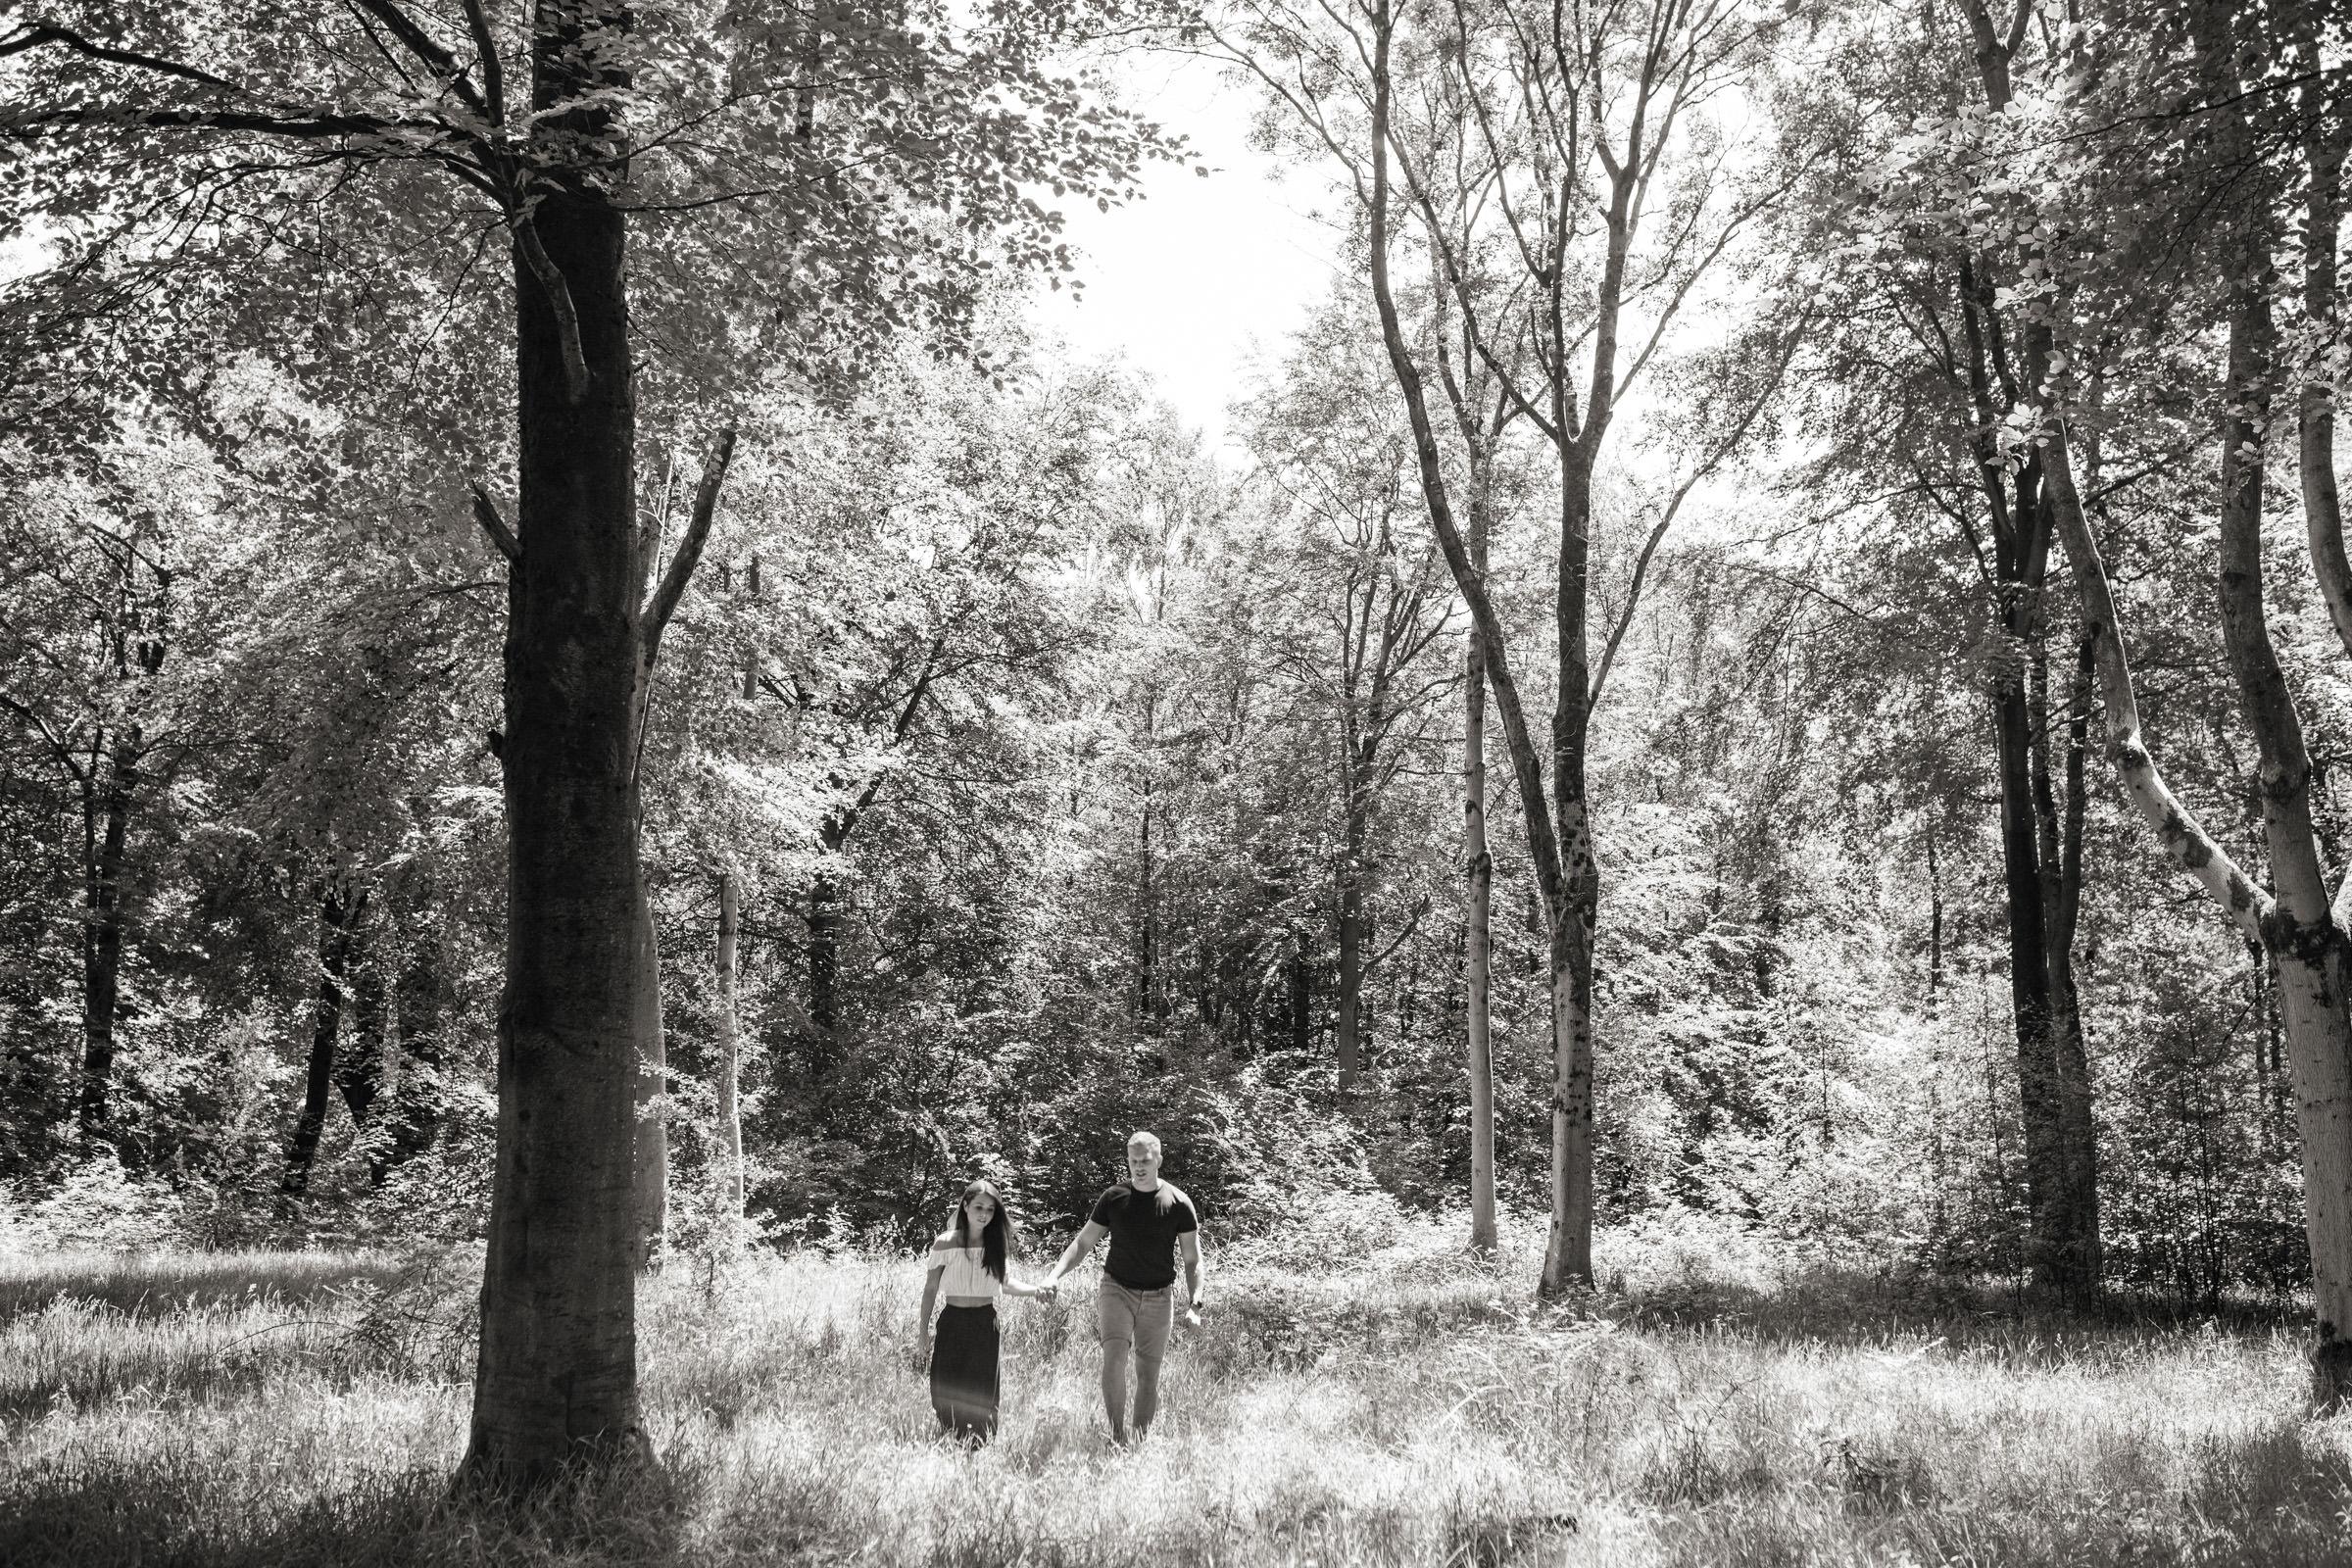 Engagement Shoot Photography - Eshoot Sessions - 007.jpg